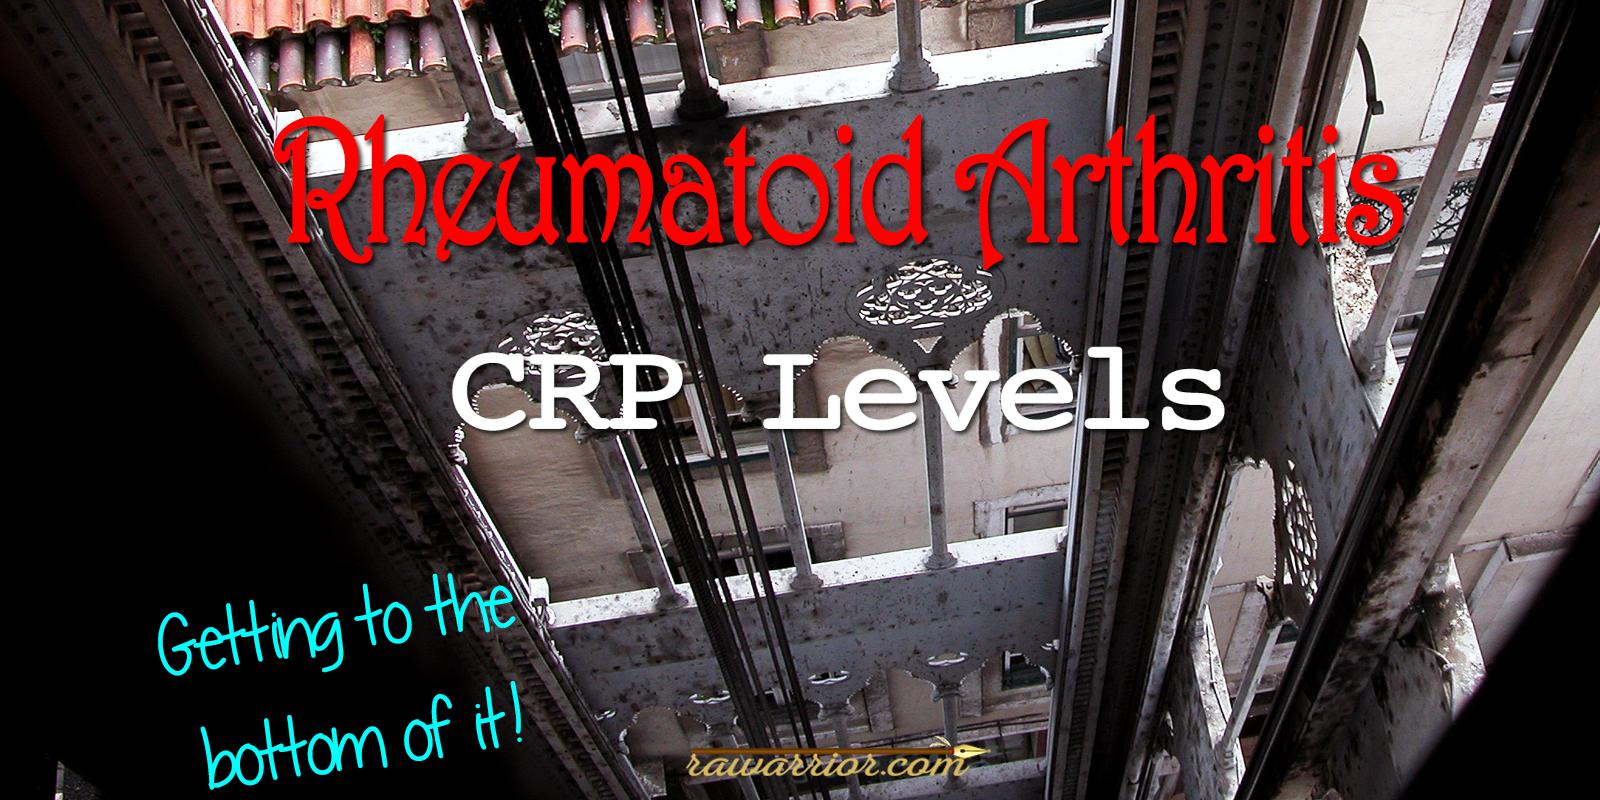 Rheumatoid Arthritis CRP Levels